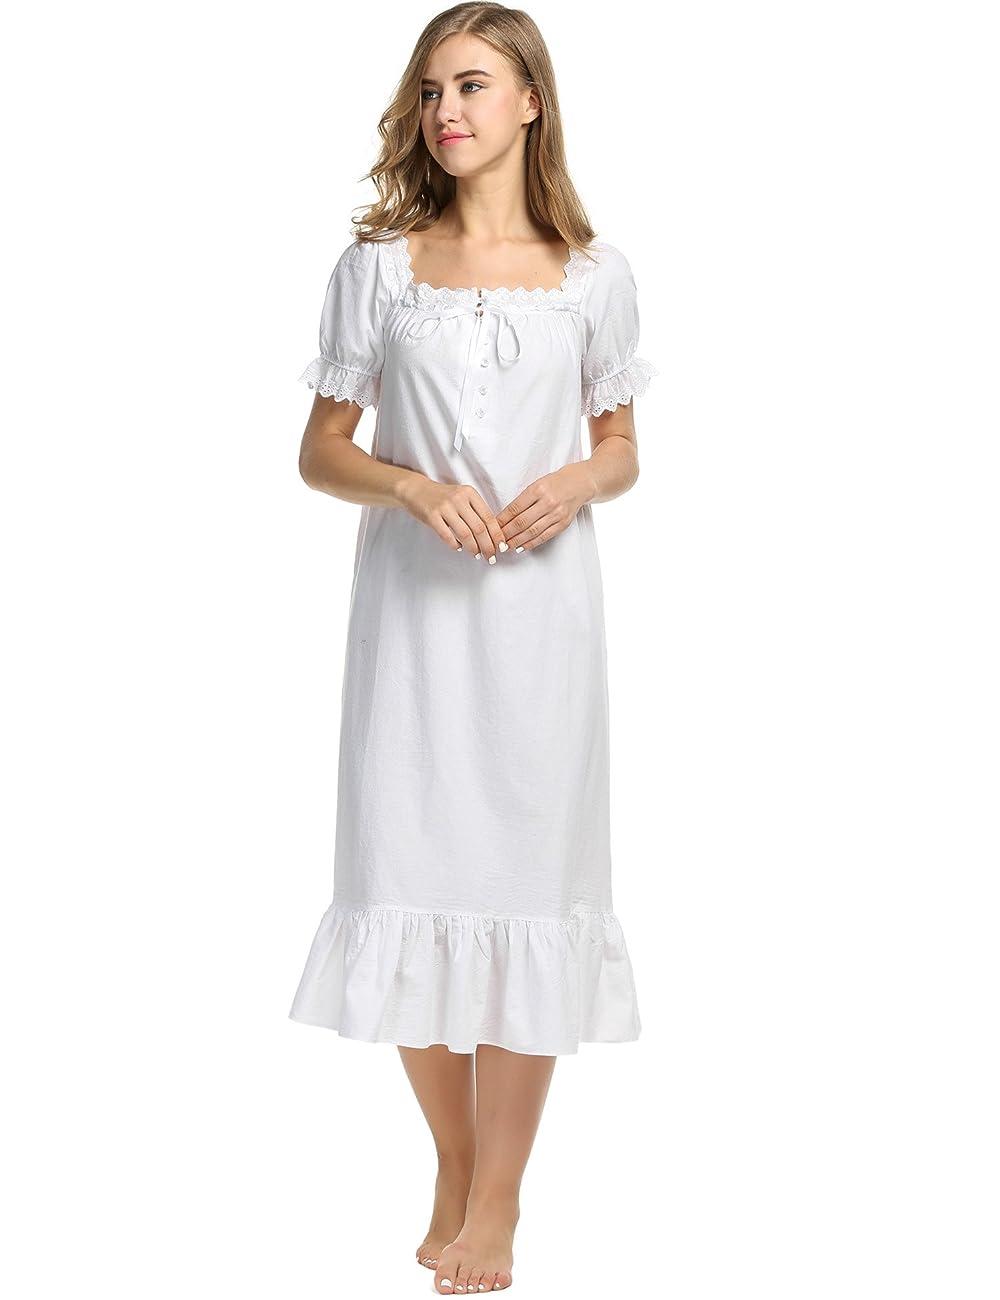 Avidlove Womens Cotton Victorian Vintage Short Sleeve Nightgown Sleepwear 0